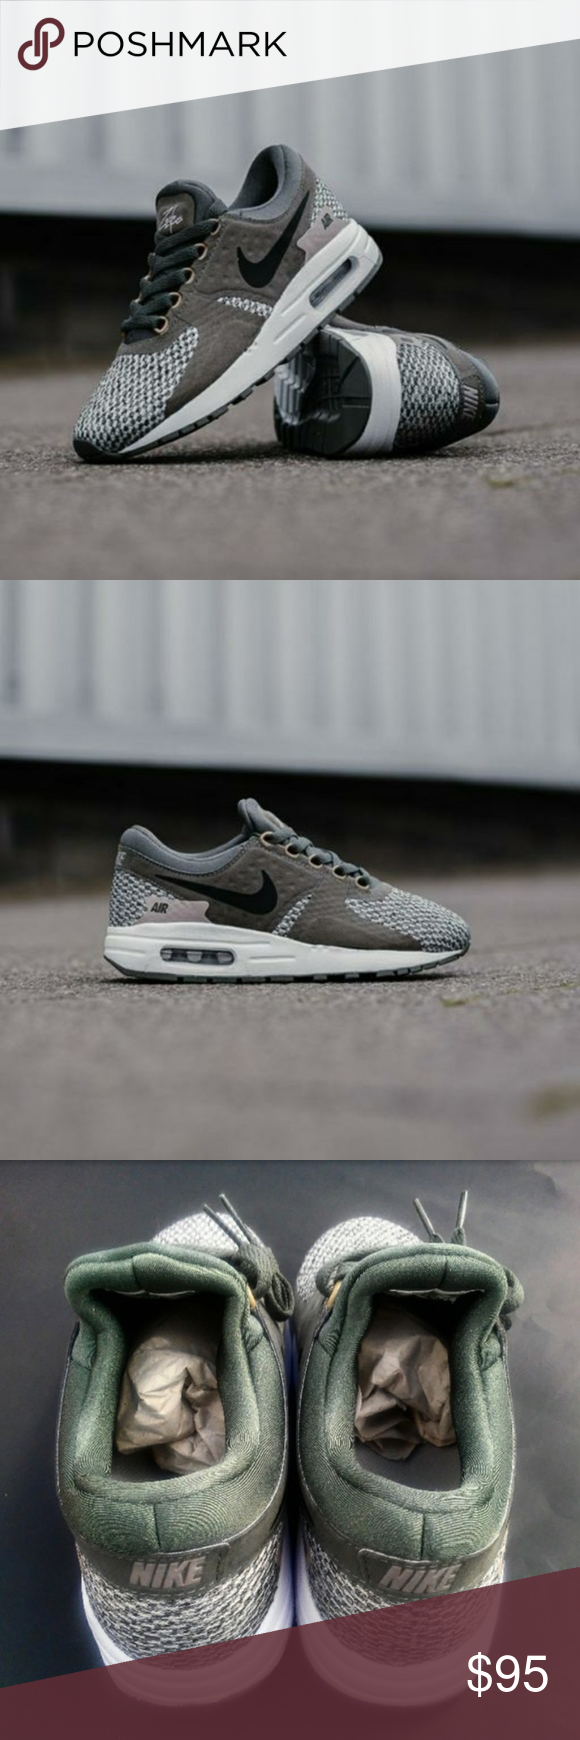 4db4cfba69 Womens/Girls Nike Air Max Zero (Size 6.5y/8w) •Brand new in box •100 ...